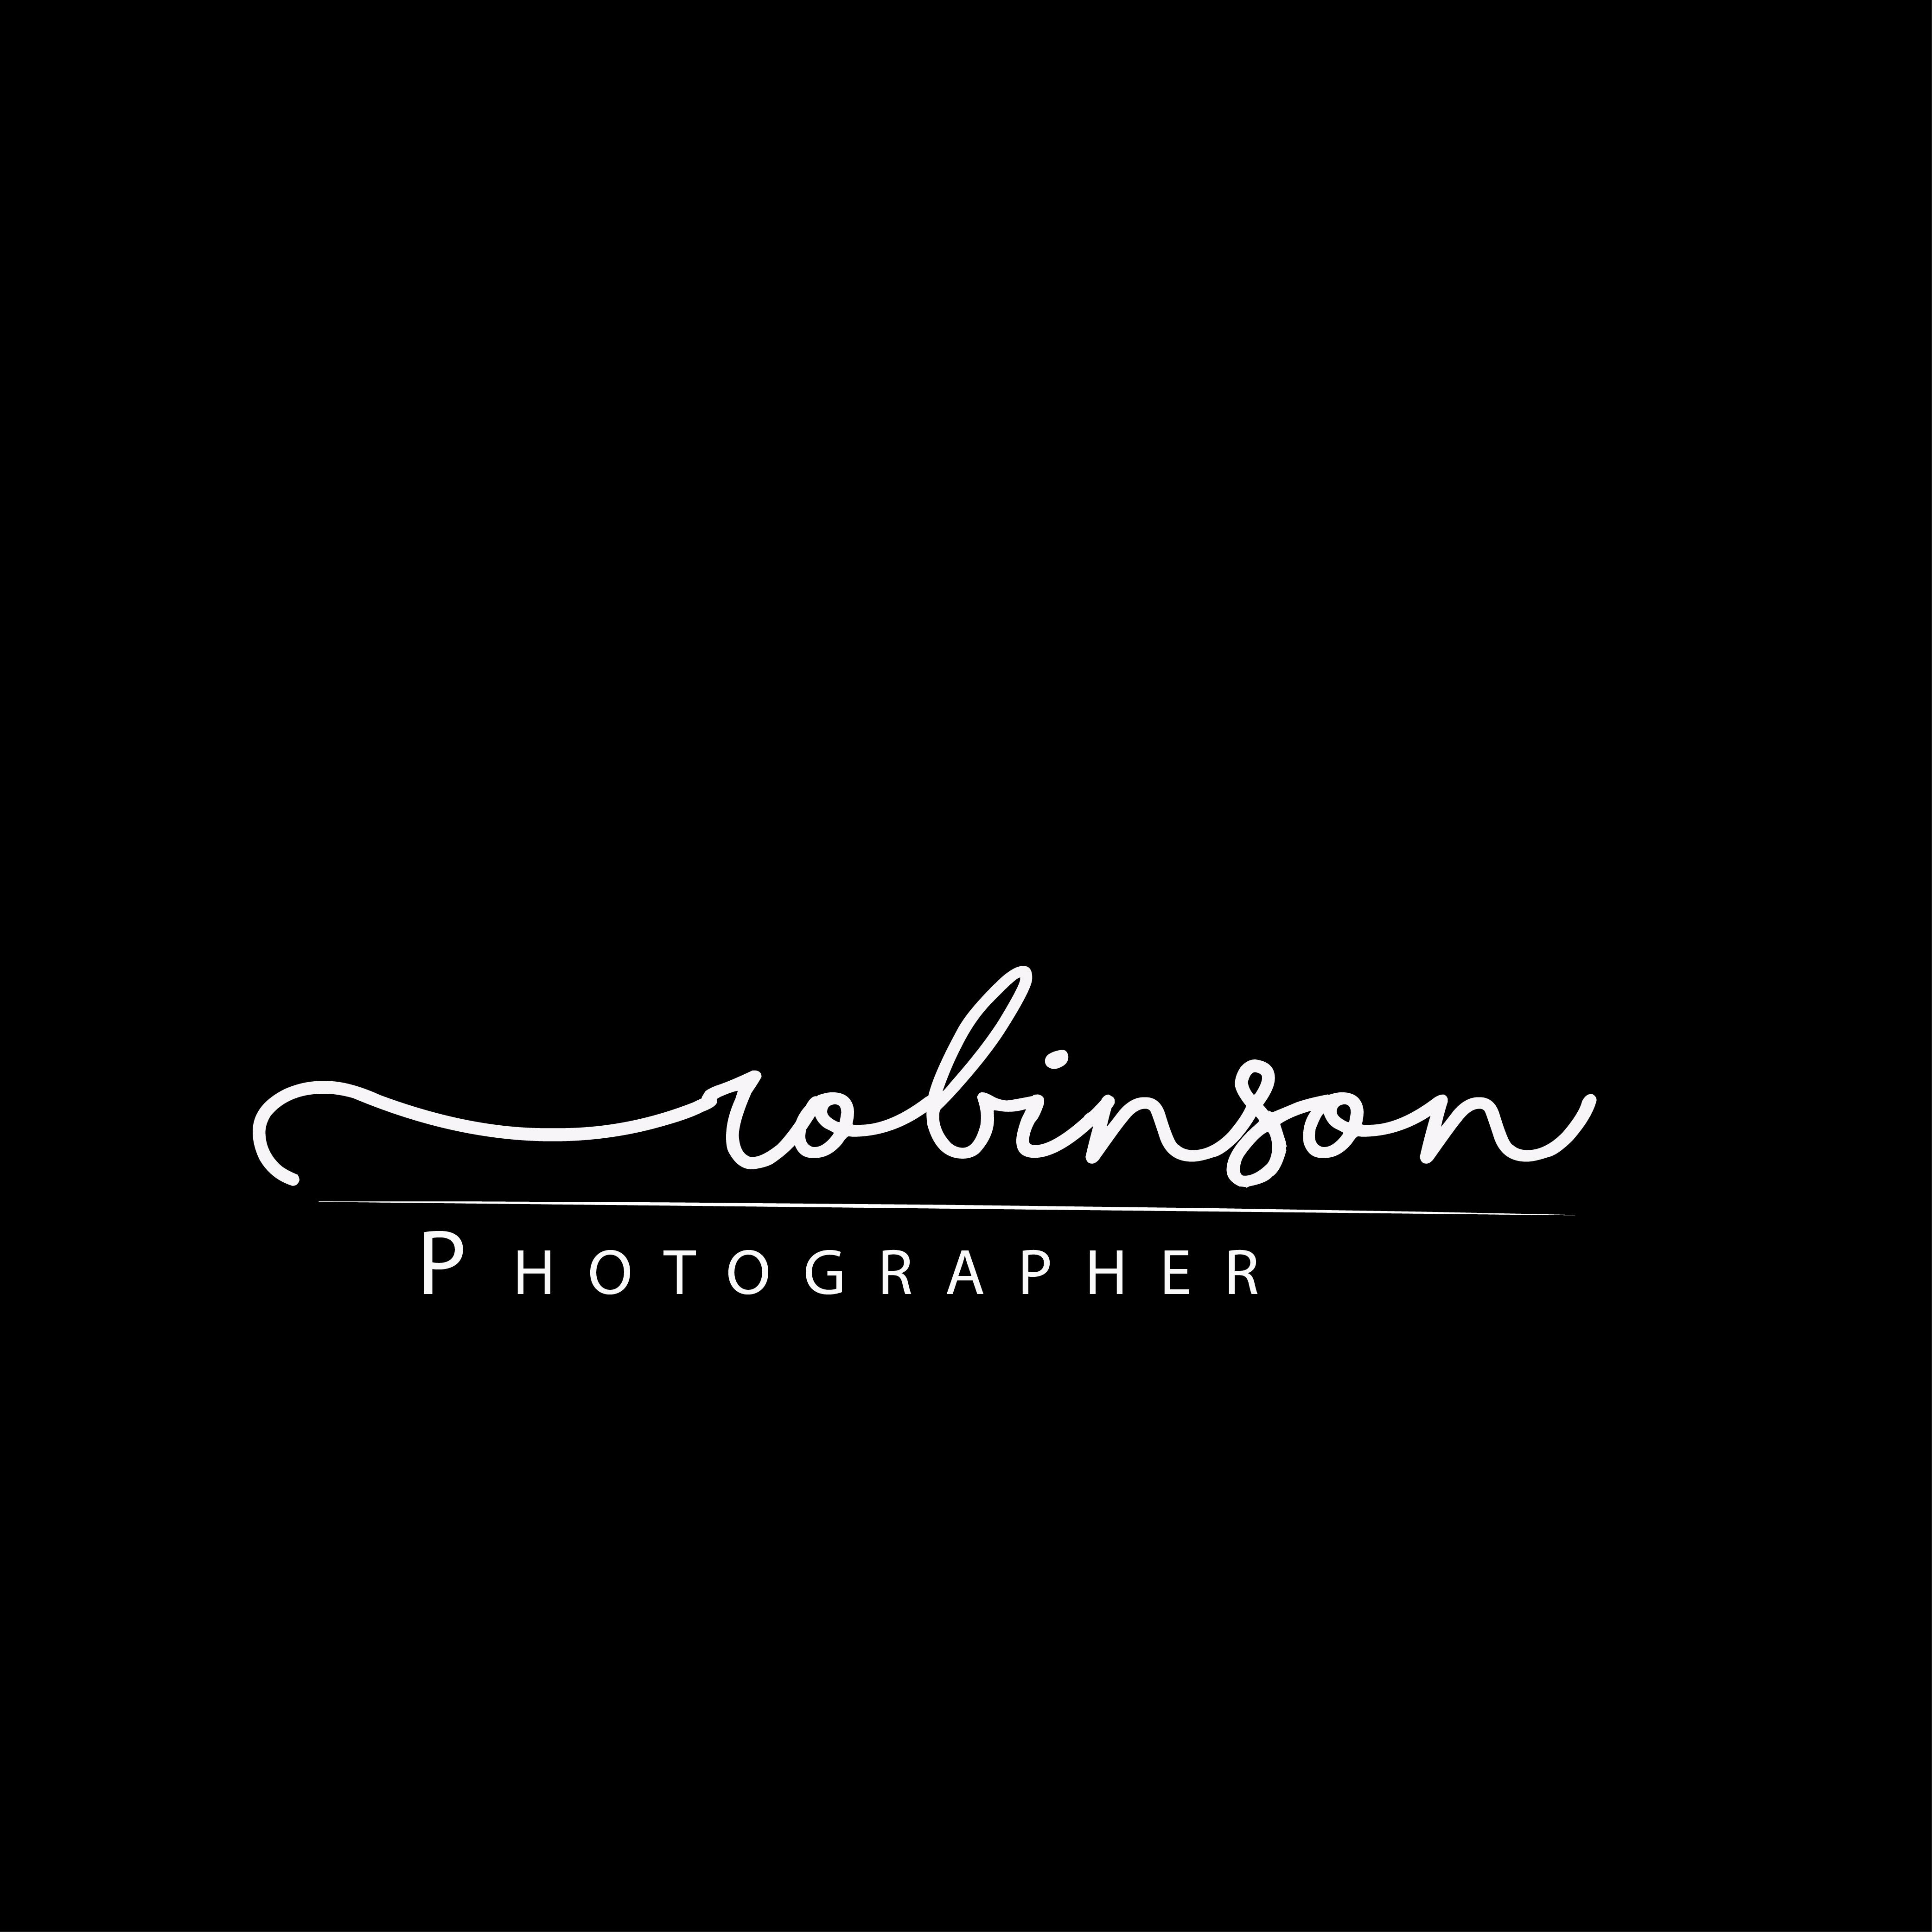 I will make a professional Handwritten logo, signature logo for you